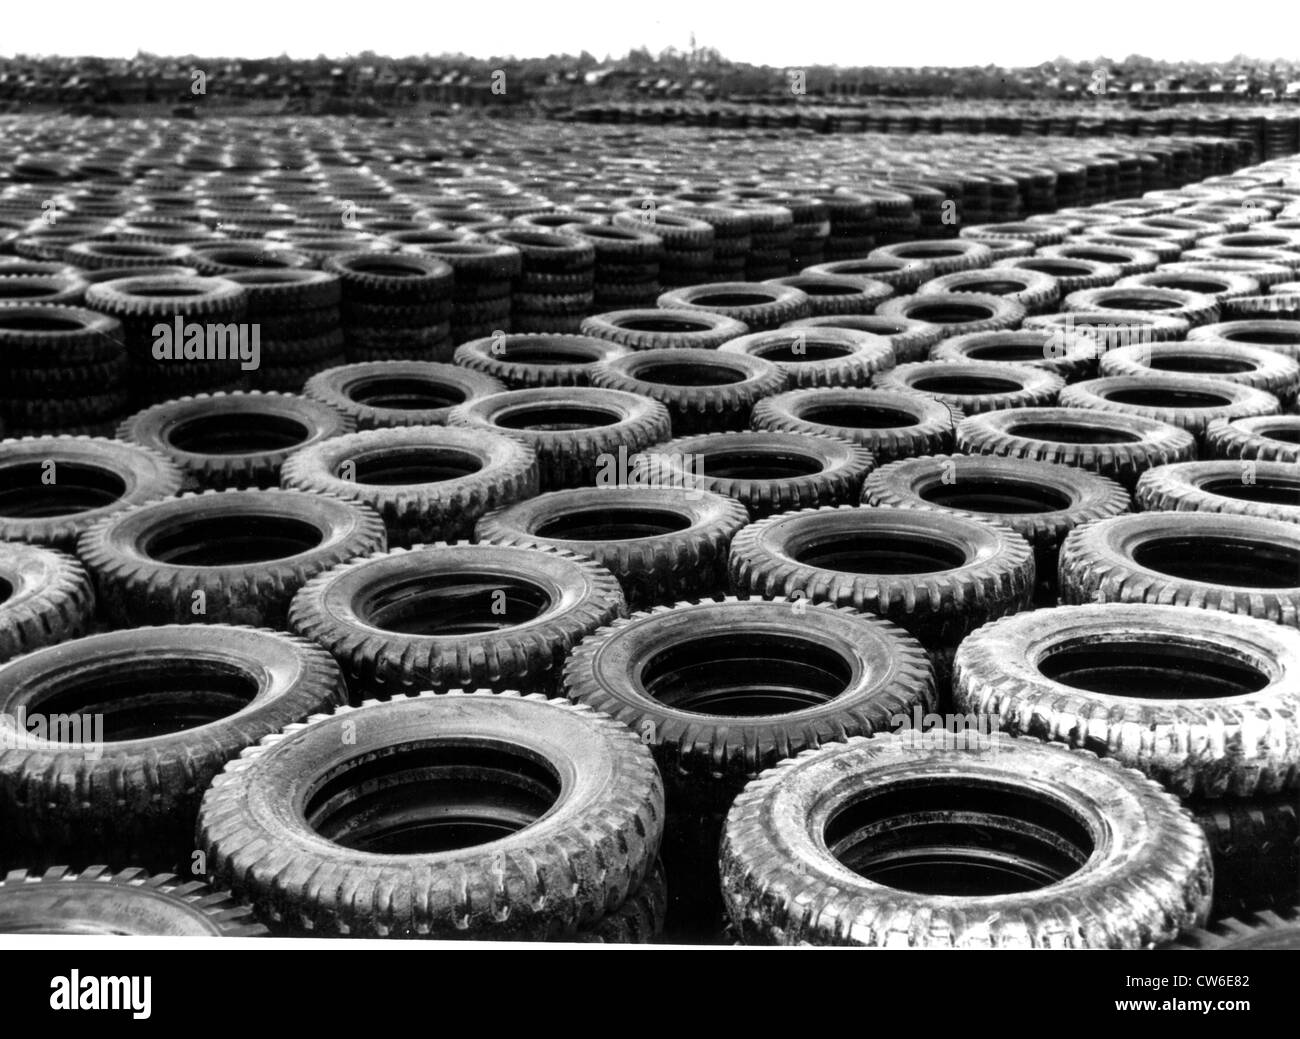 U.S. Army tires await repair in France, 1944 - Stock Image